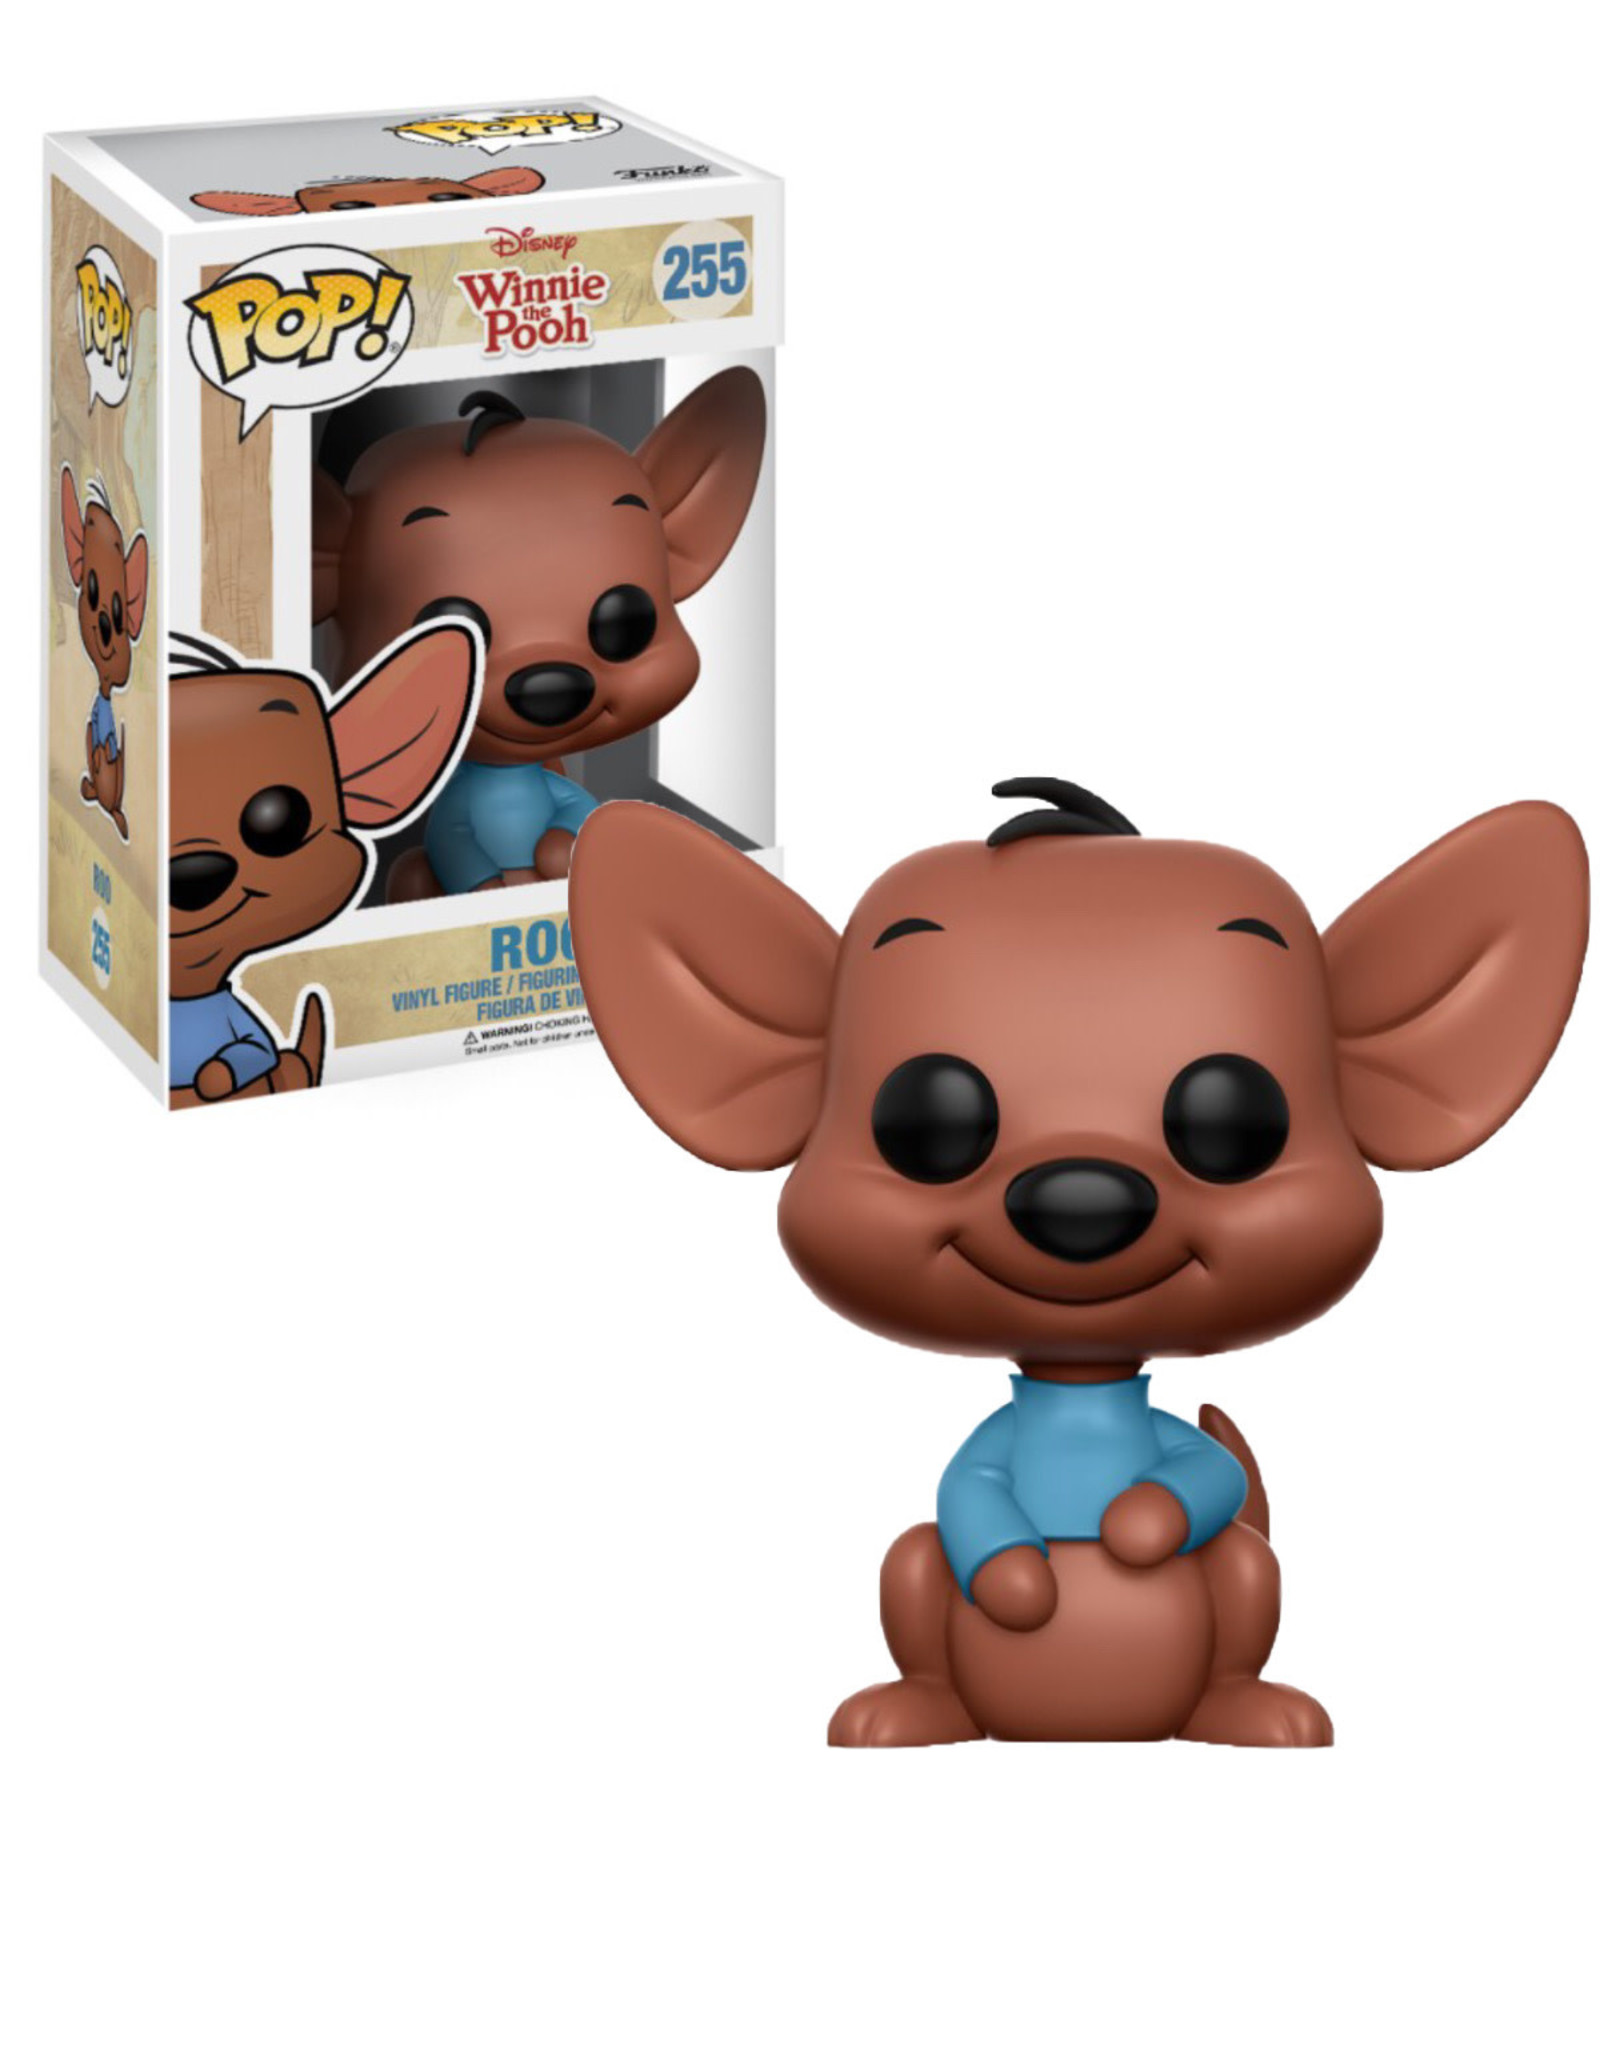 Winnie the Pooh 255 ( Funko Pop ) Roo